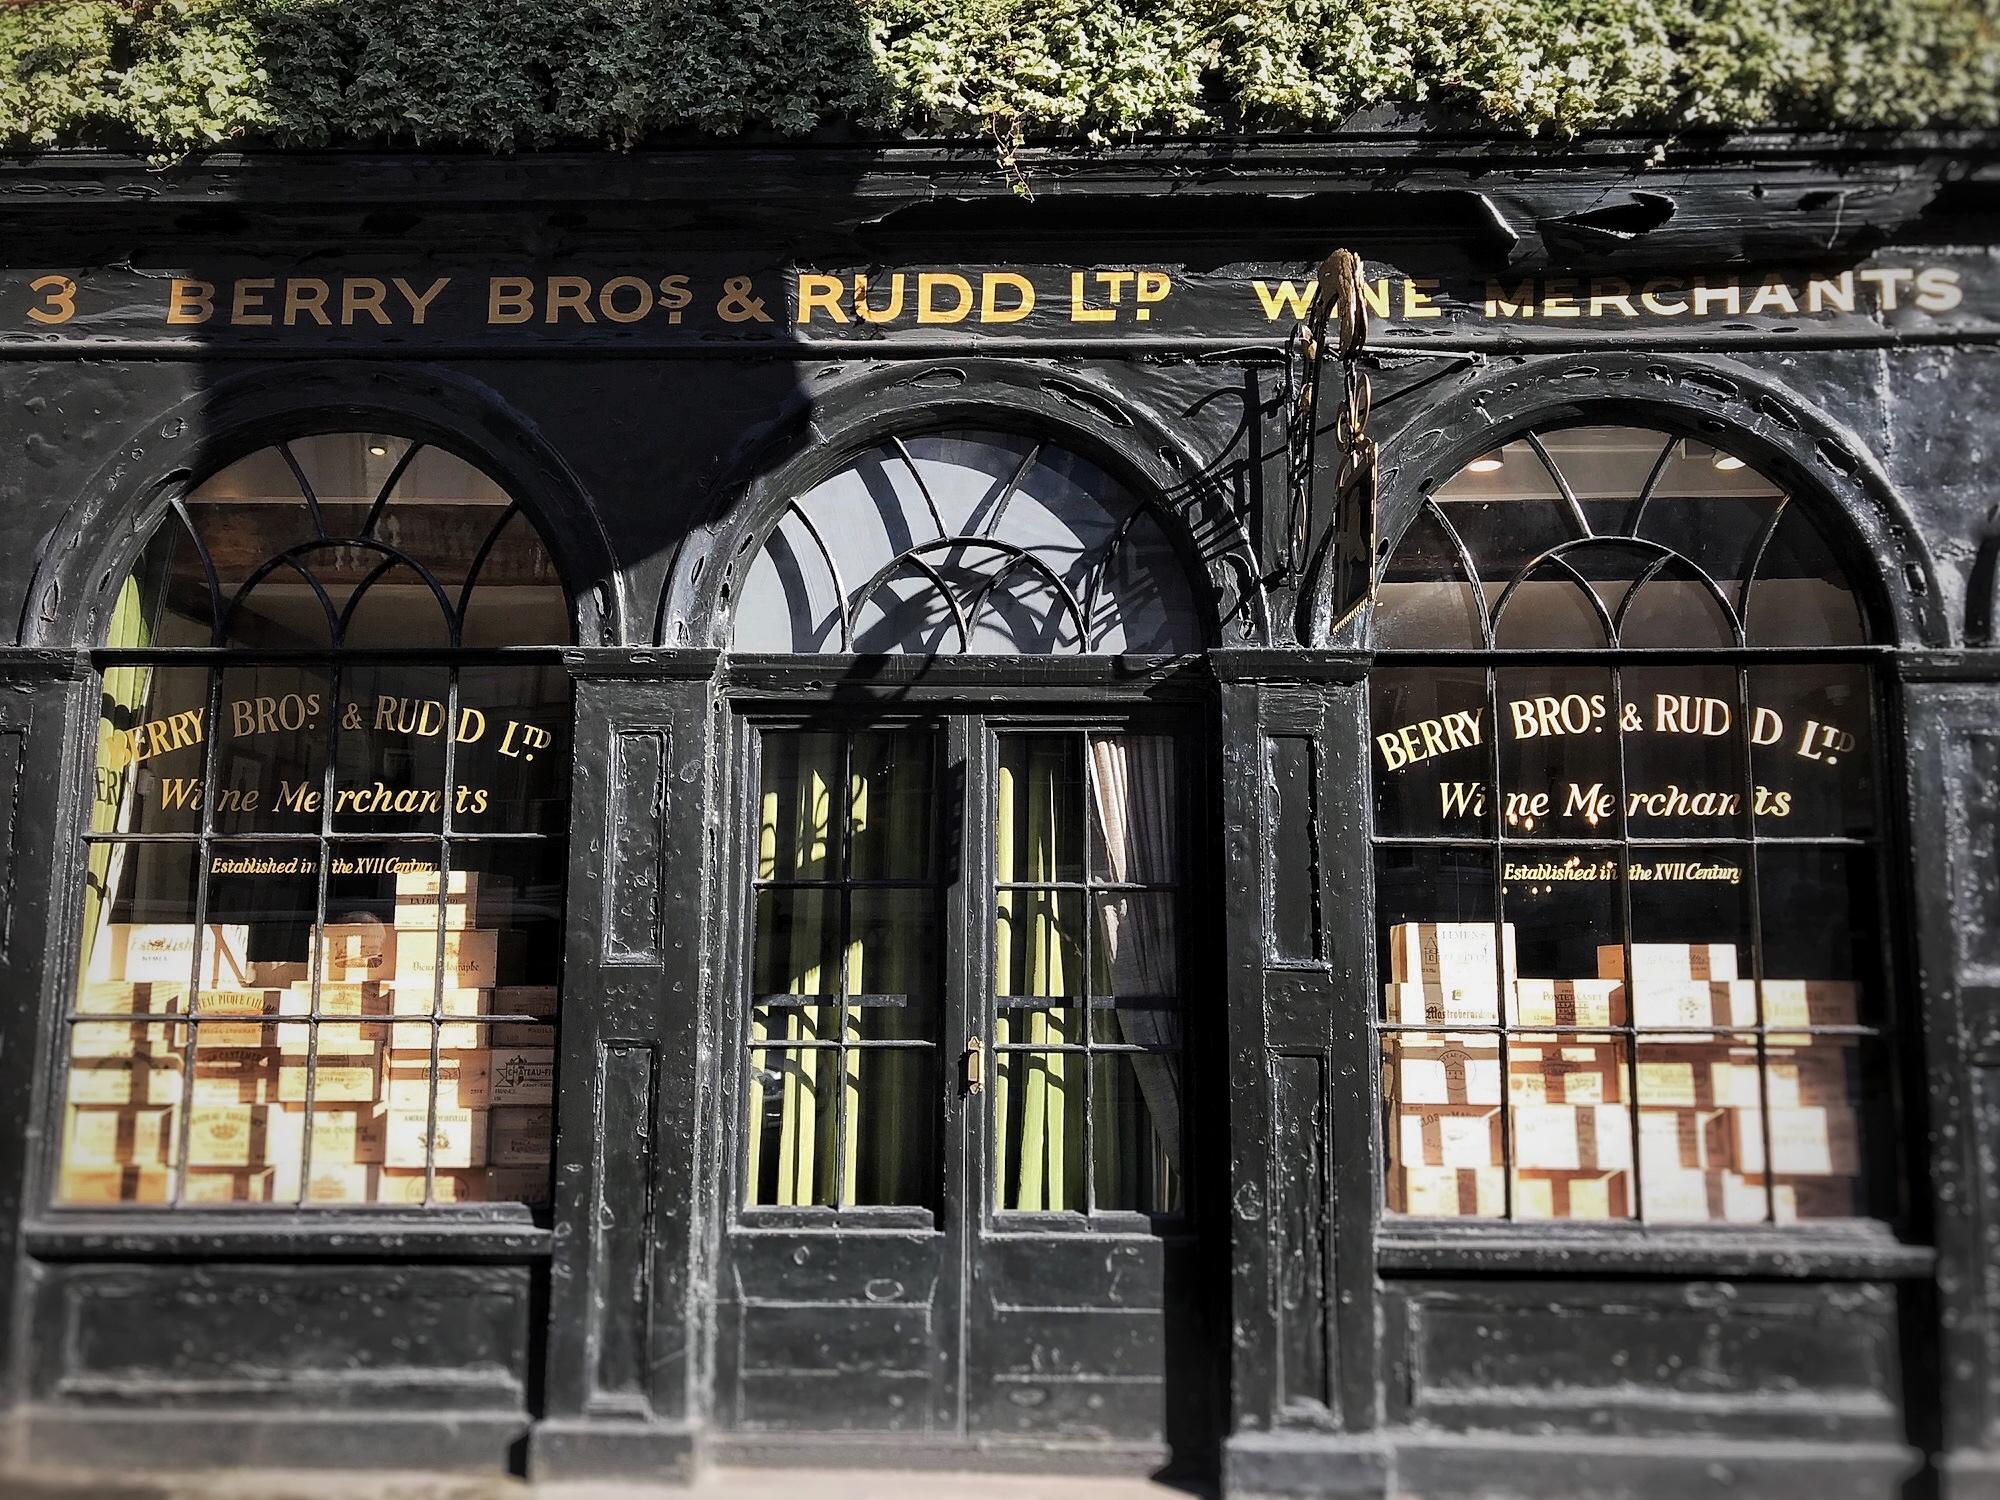 BERRY BROS & RUDD. London Oldest Wine Merchant